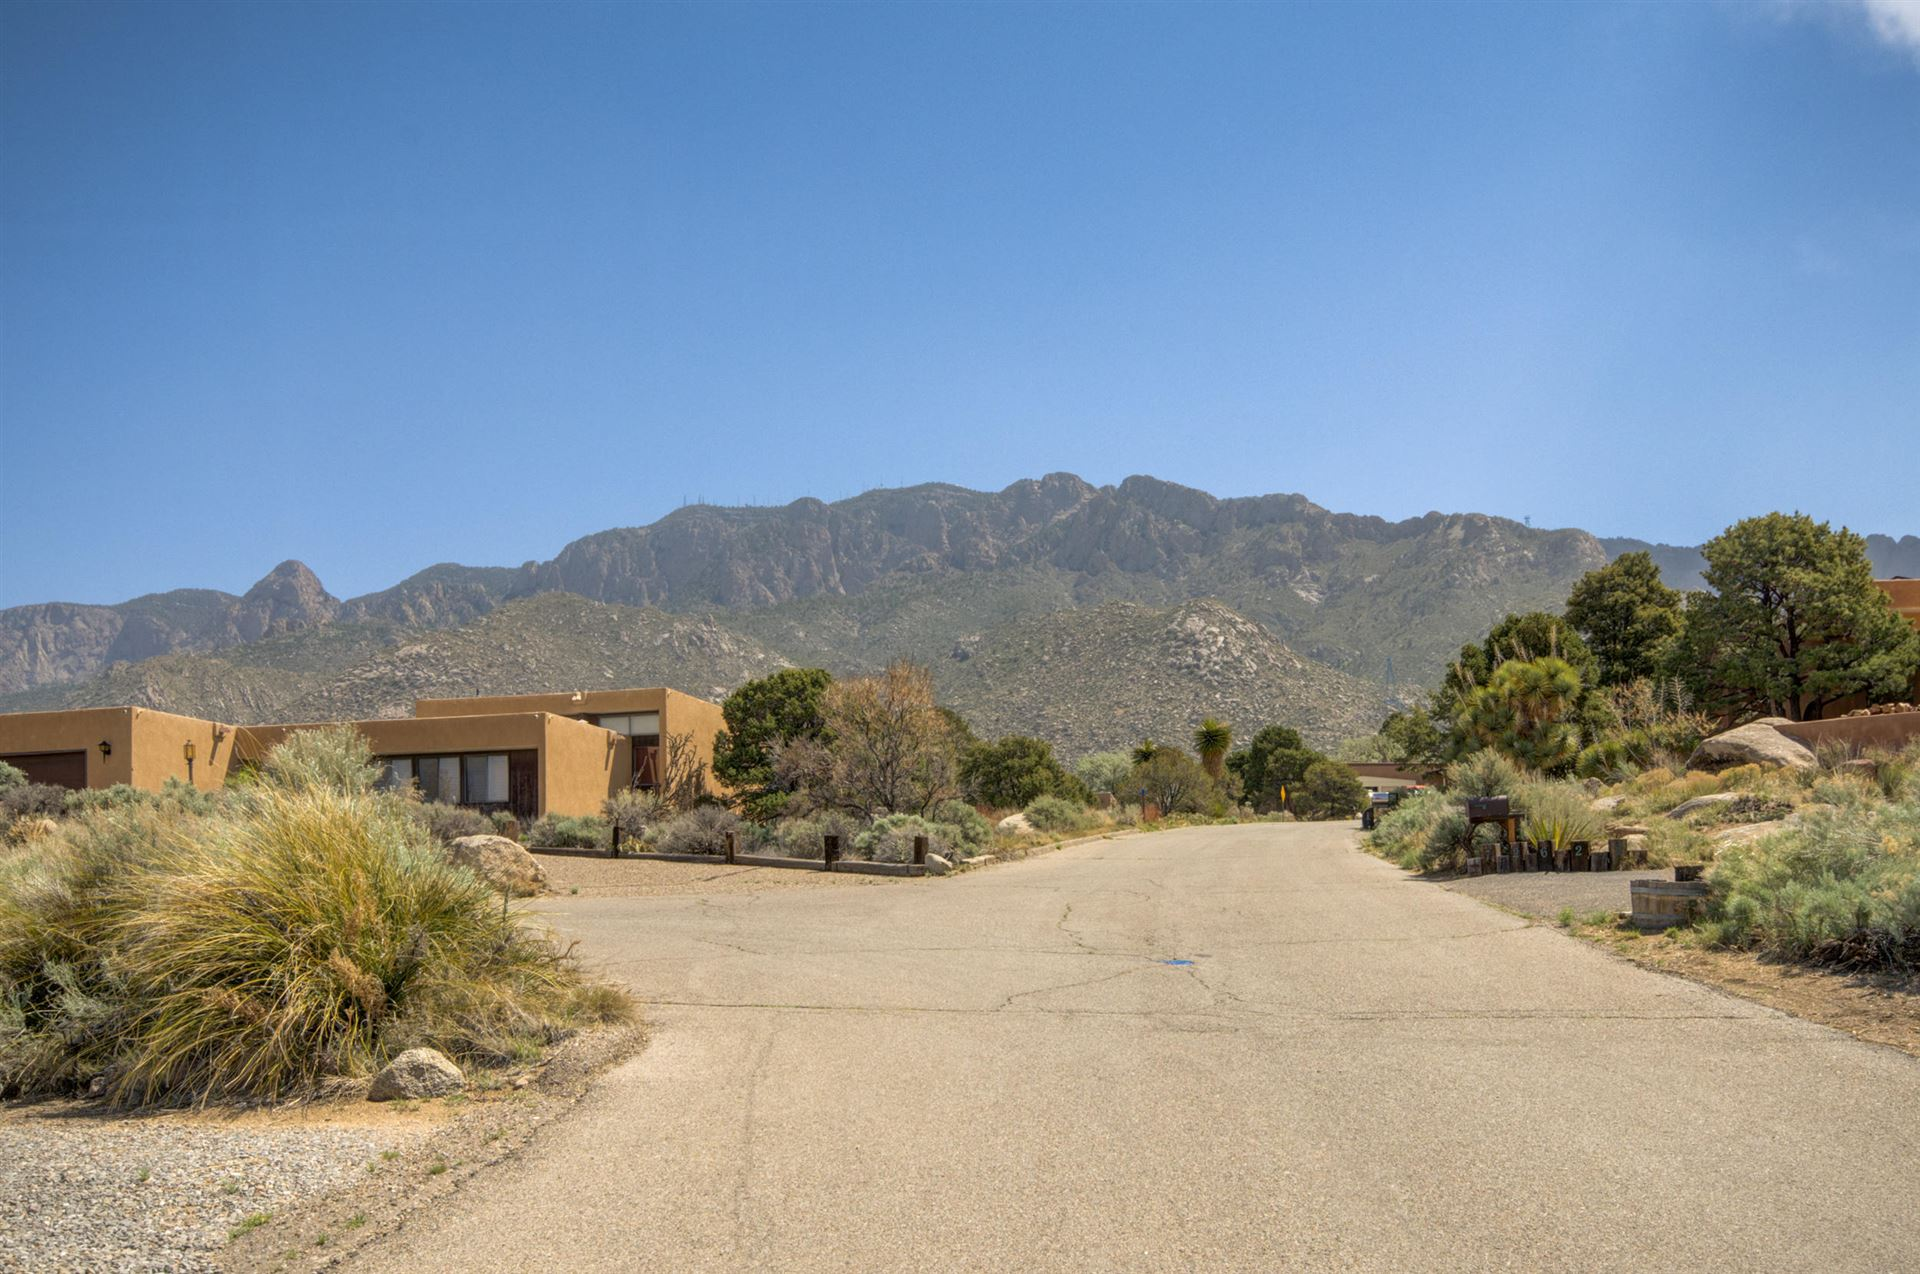 Photo of 726 TRAMWAY VISTA Drive NE #21, Albuquerque, NM 87122 (MLS # 991513)